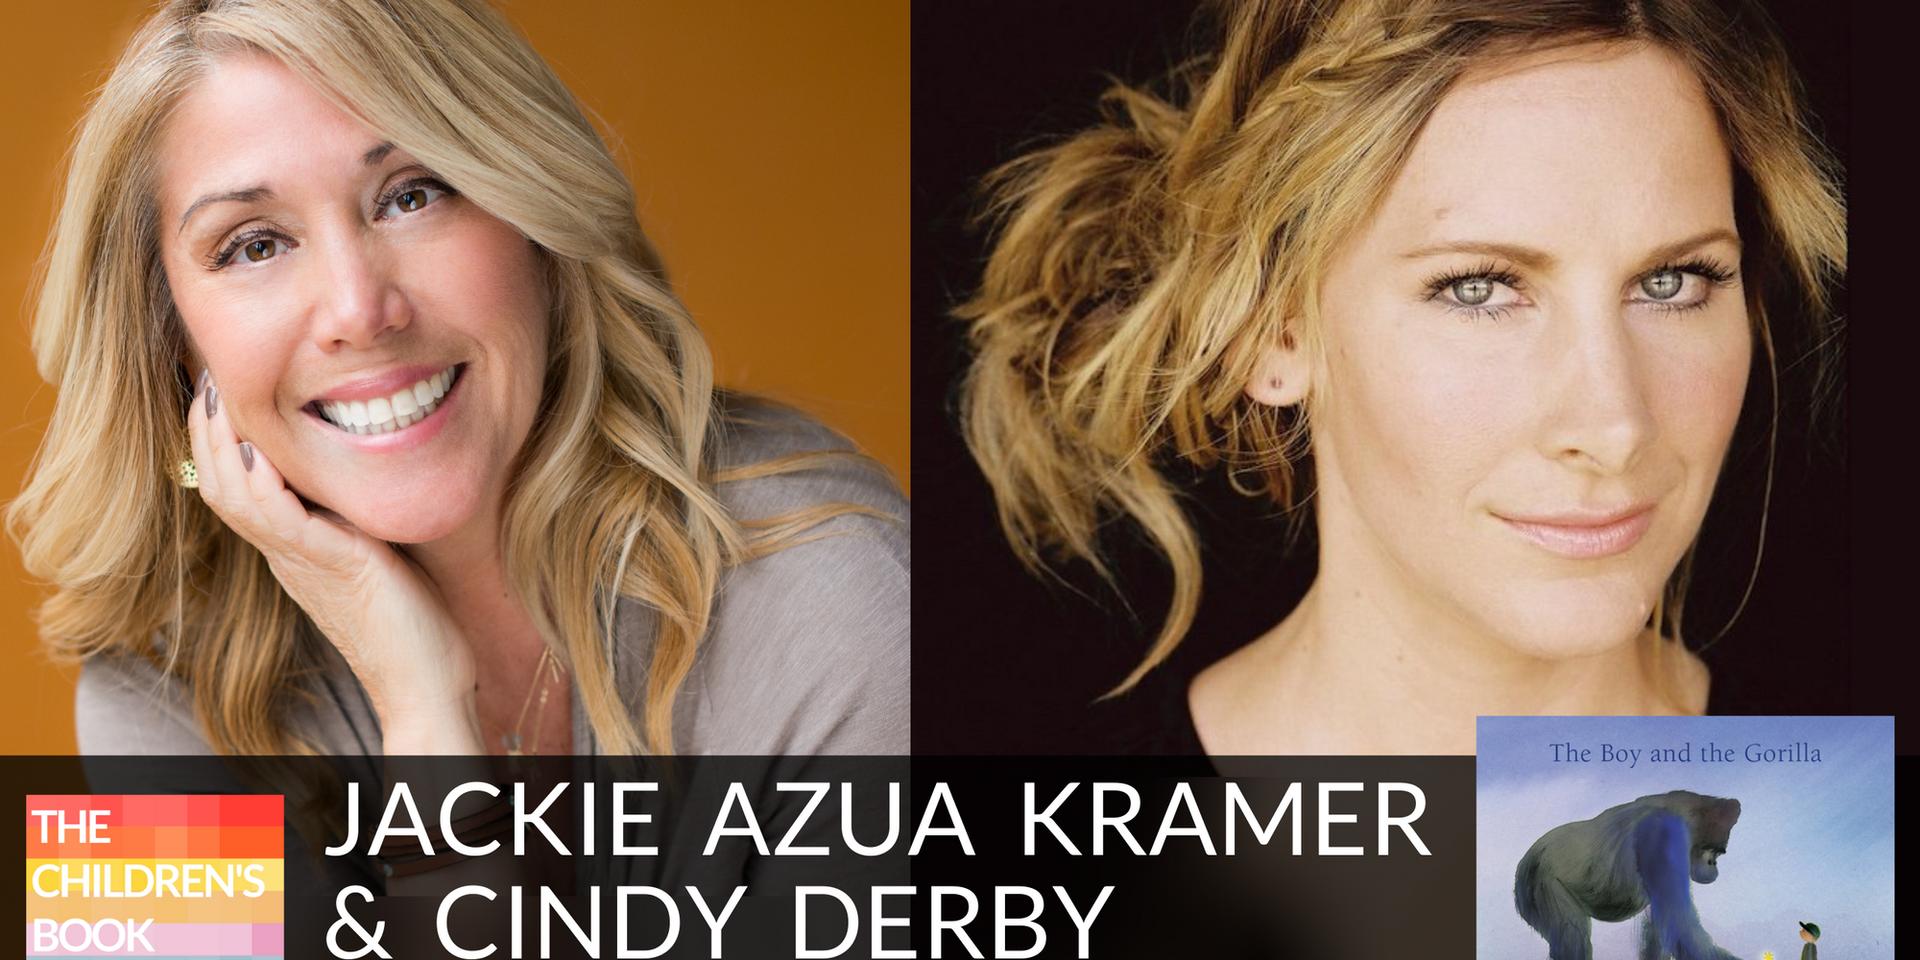 Jackie Azúa Kramer and Cindy Derby